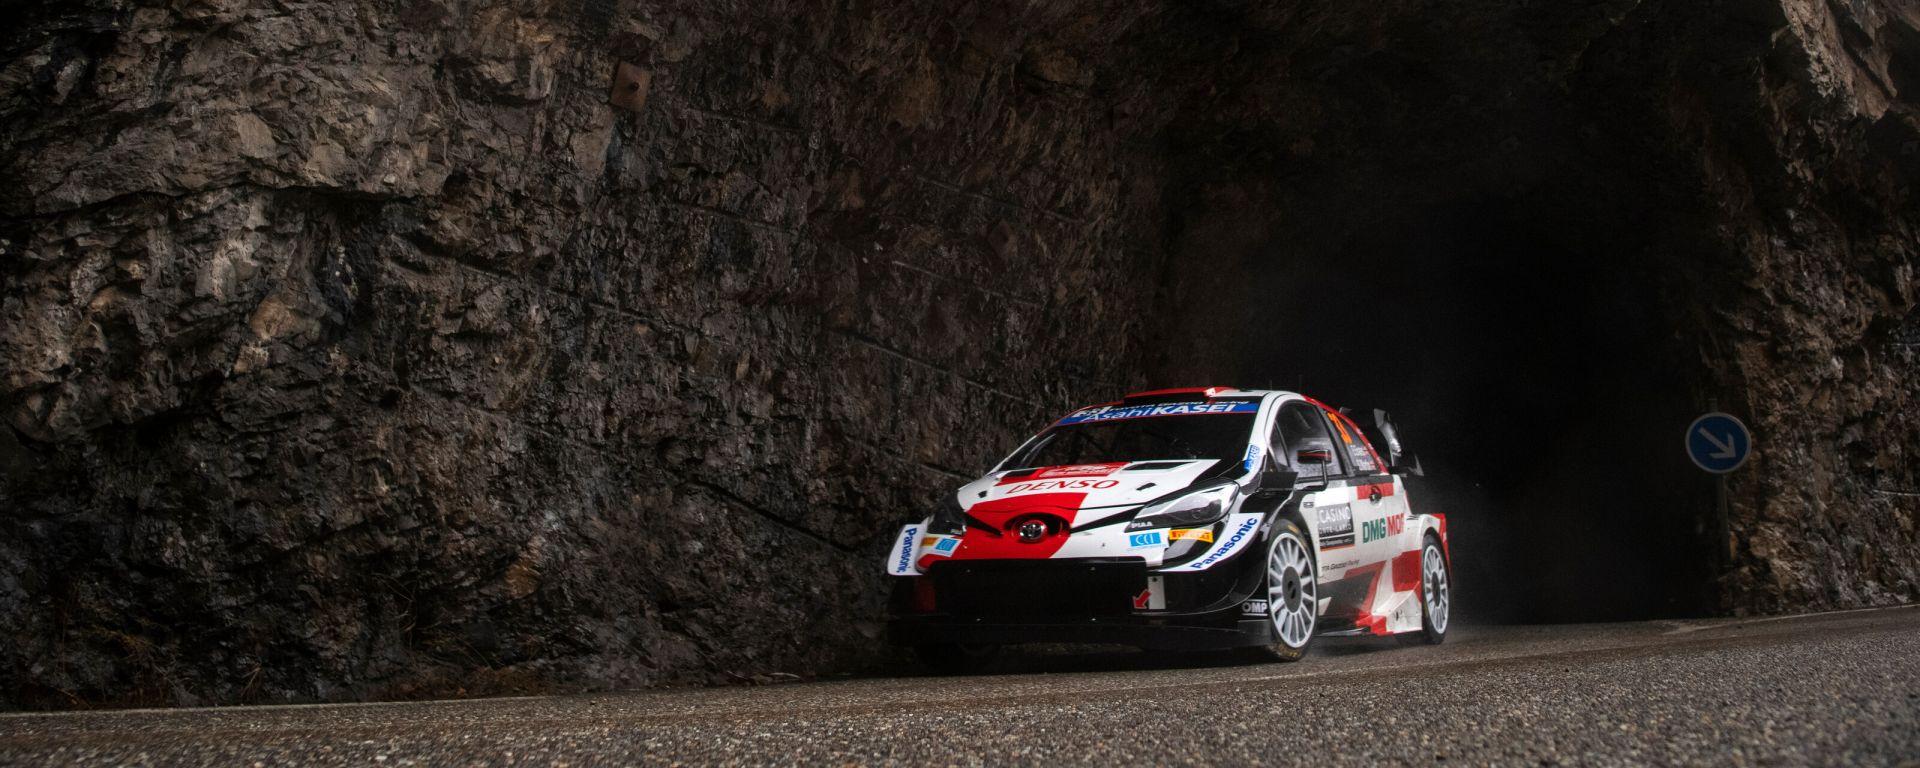 WRC, Rally Monte Carlo 2021: Elfyn Evans (Toyota)